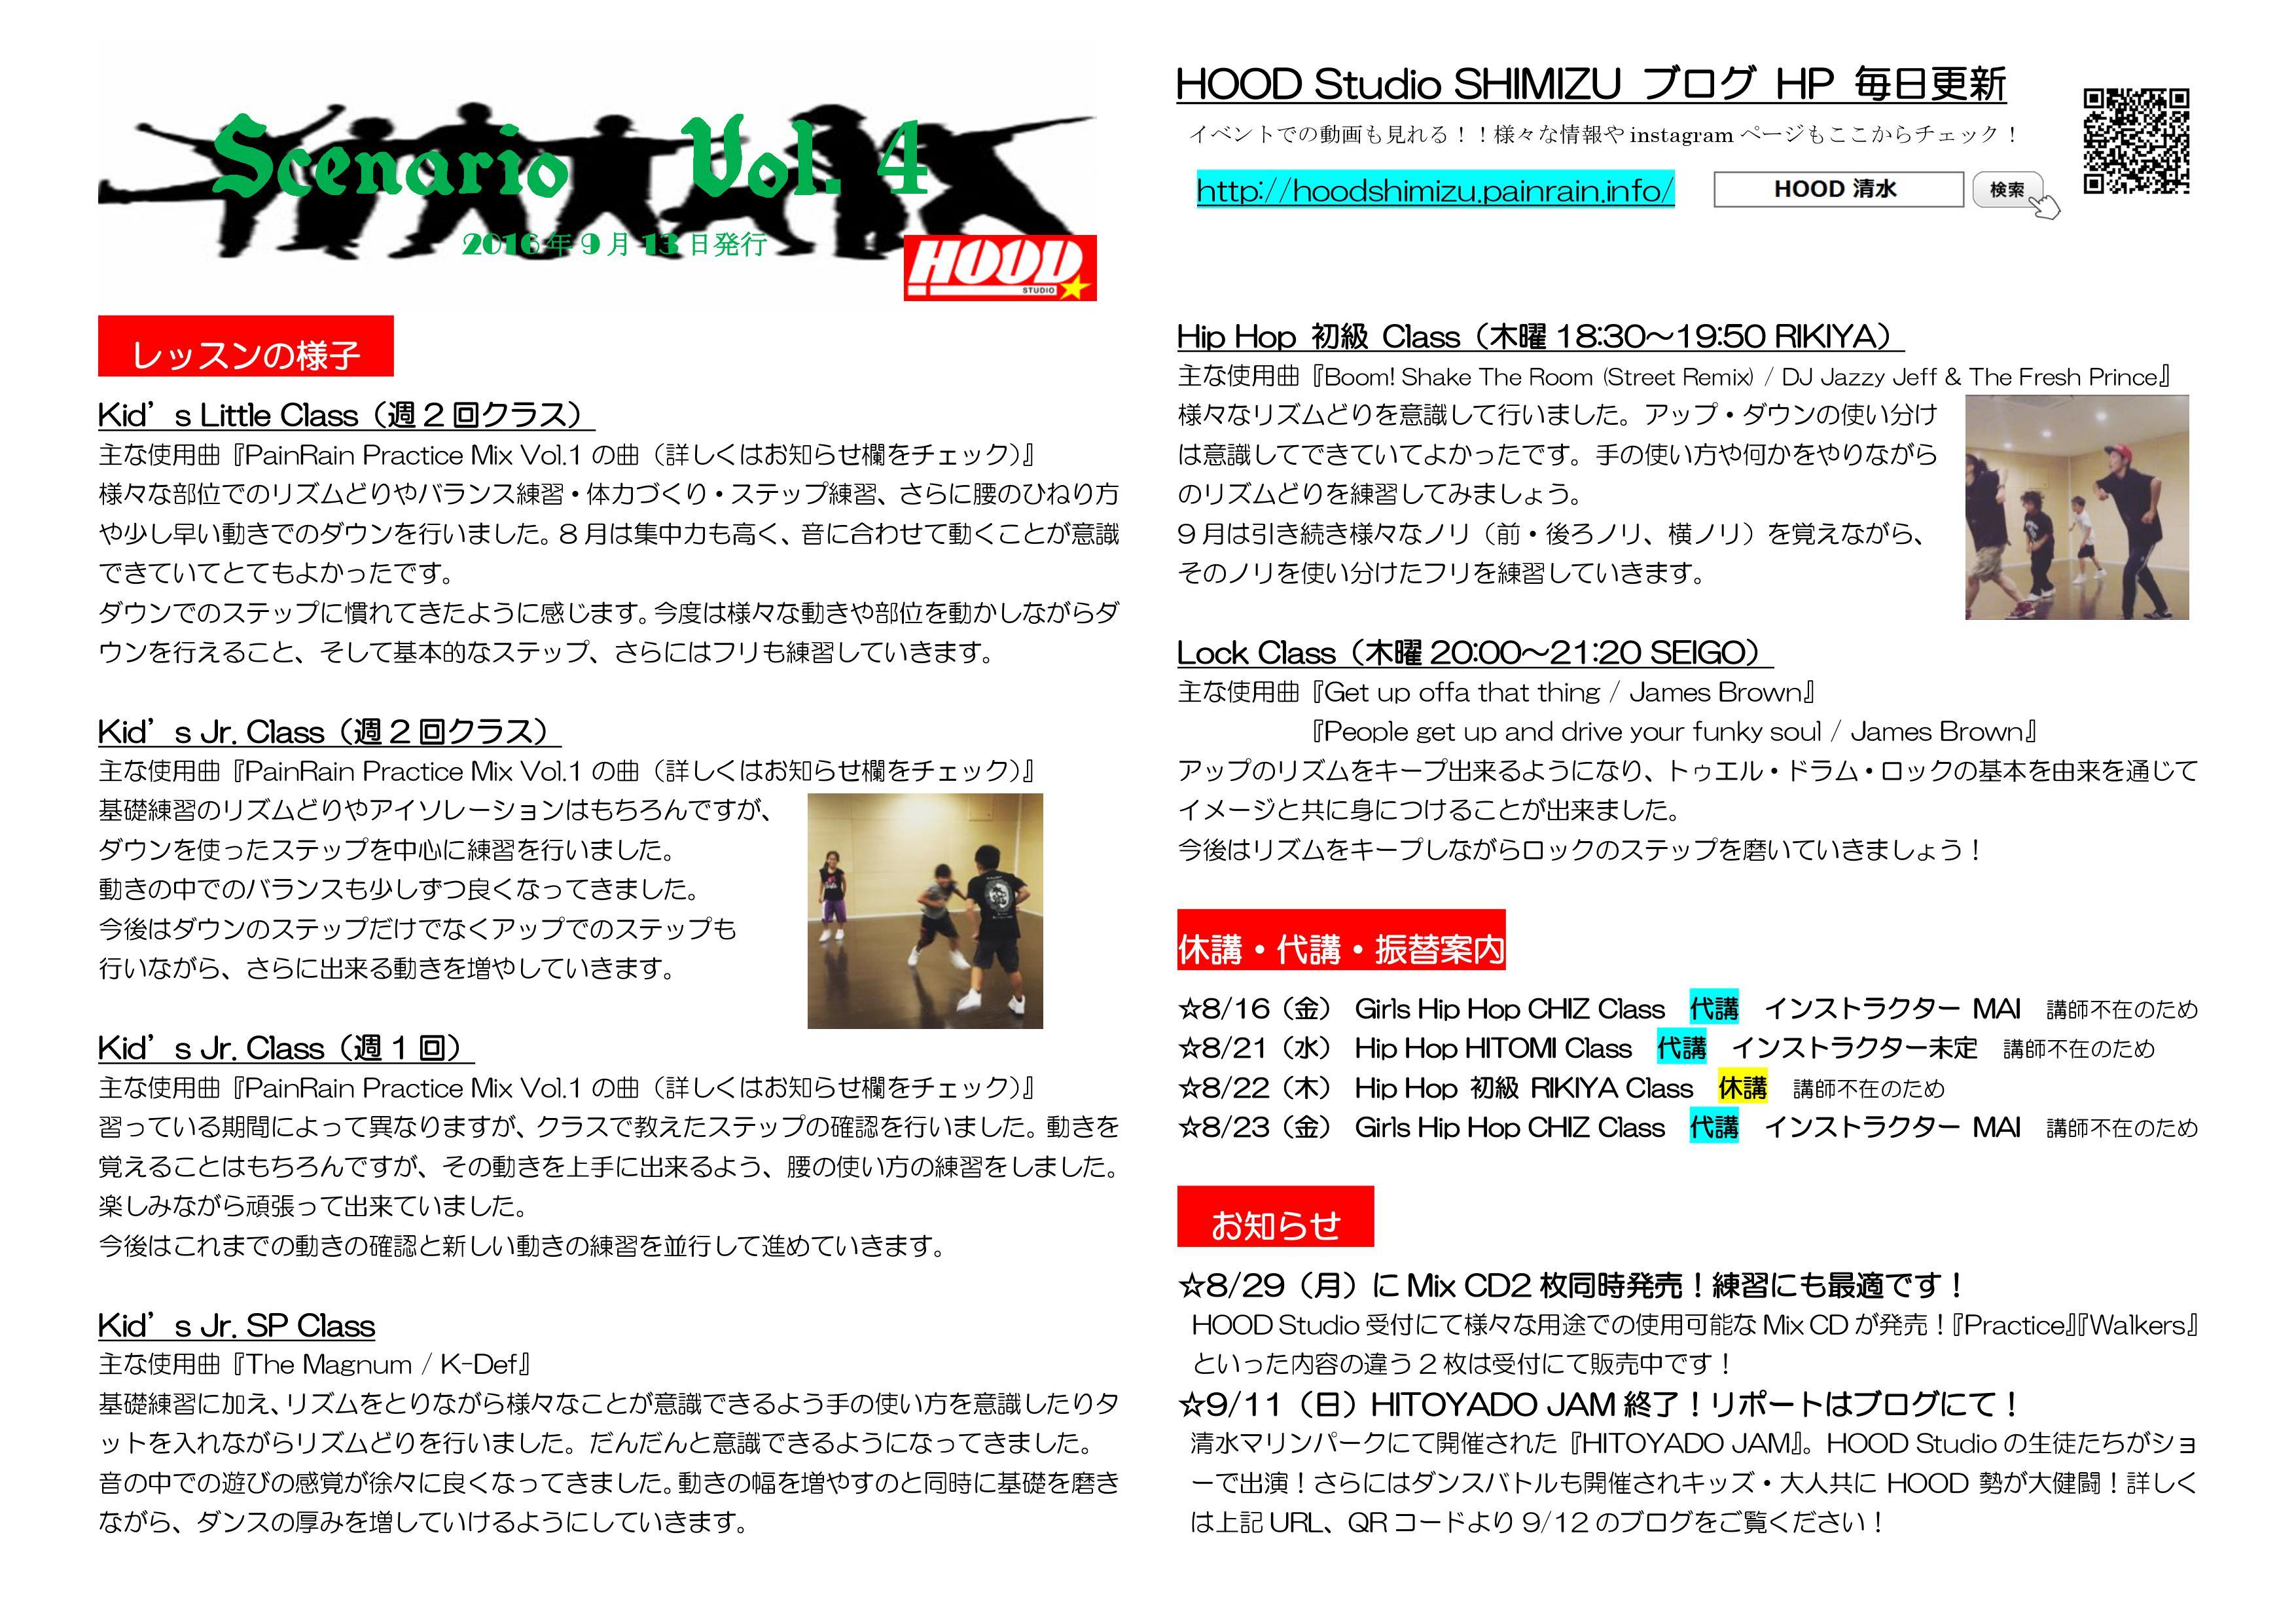 HOOD キッズダンス 清水区 ダンススタジオ Scenario Vol.4